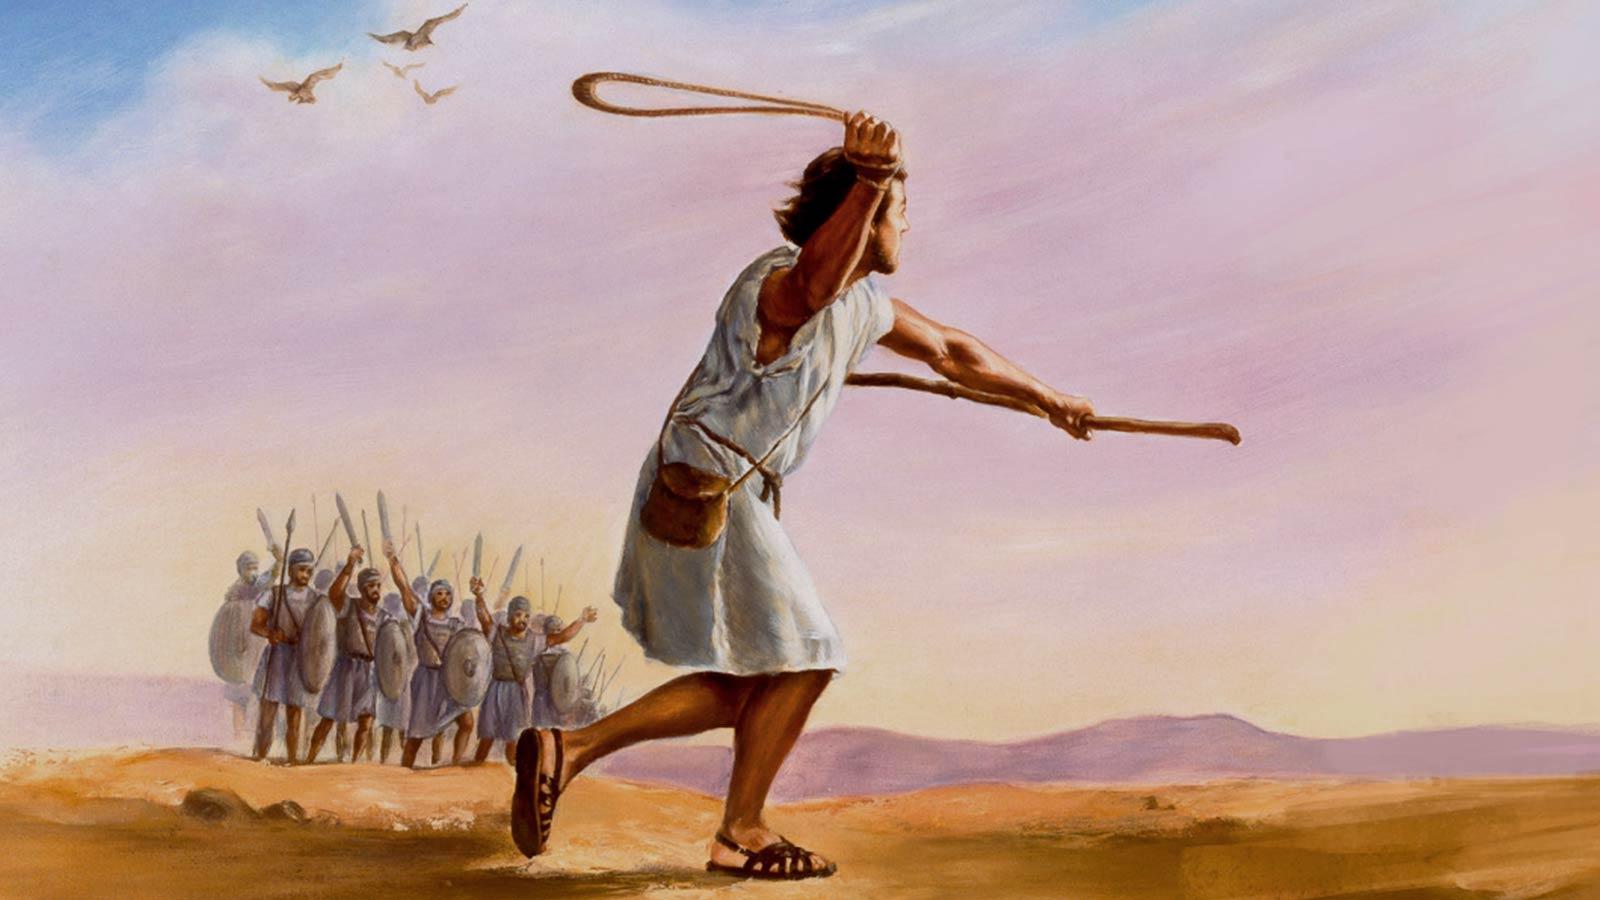 David-heroes-de-la-fe